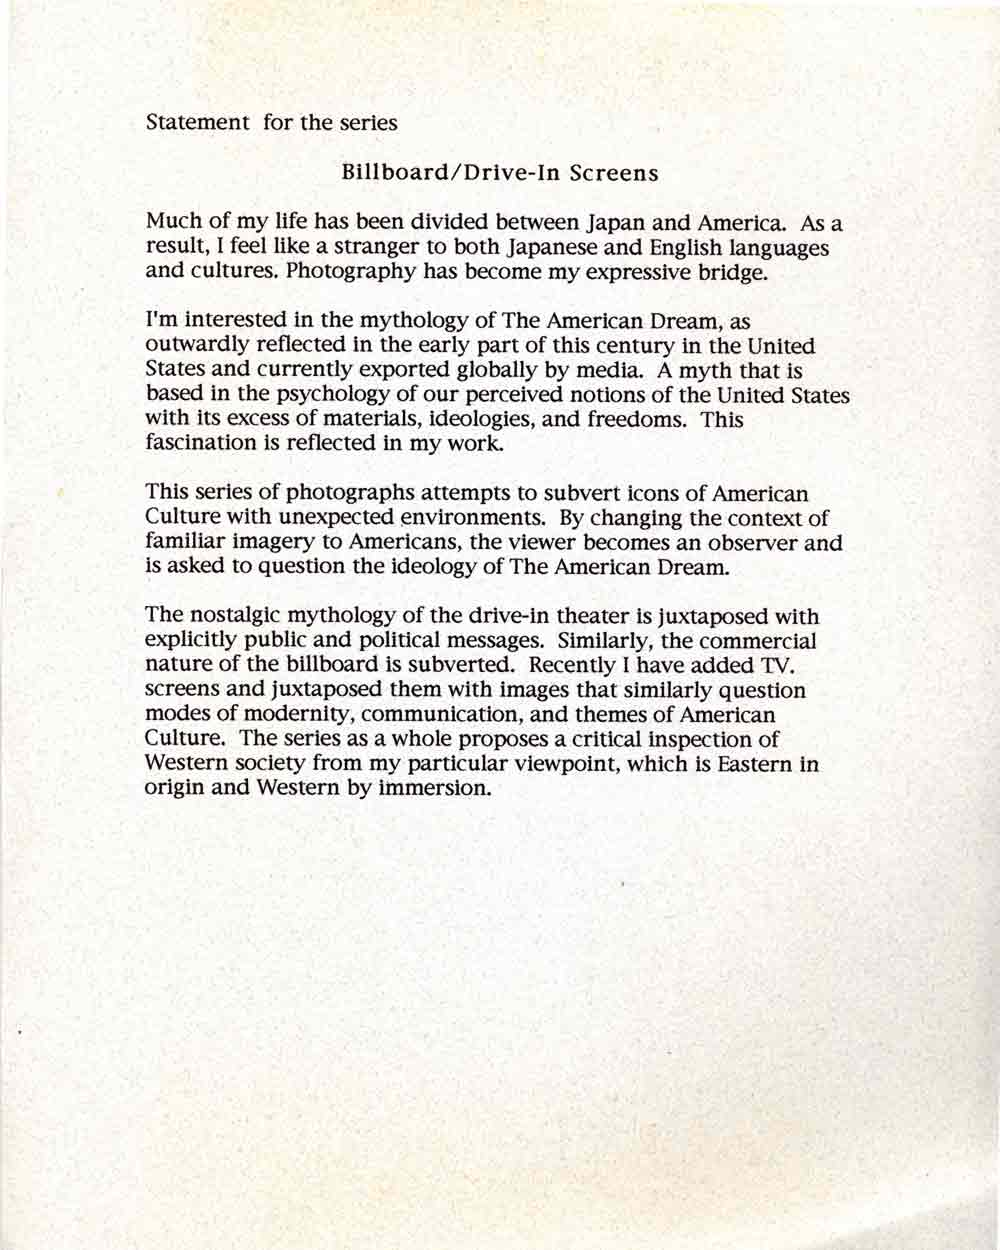 Billboard/Drive-In statement